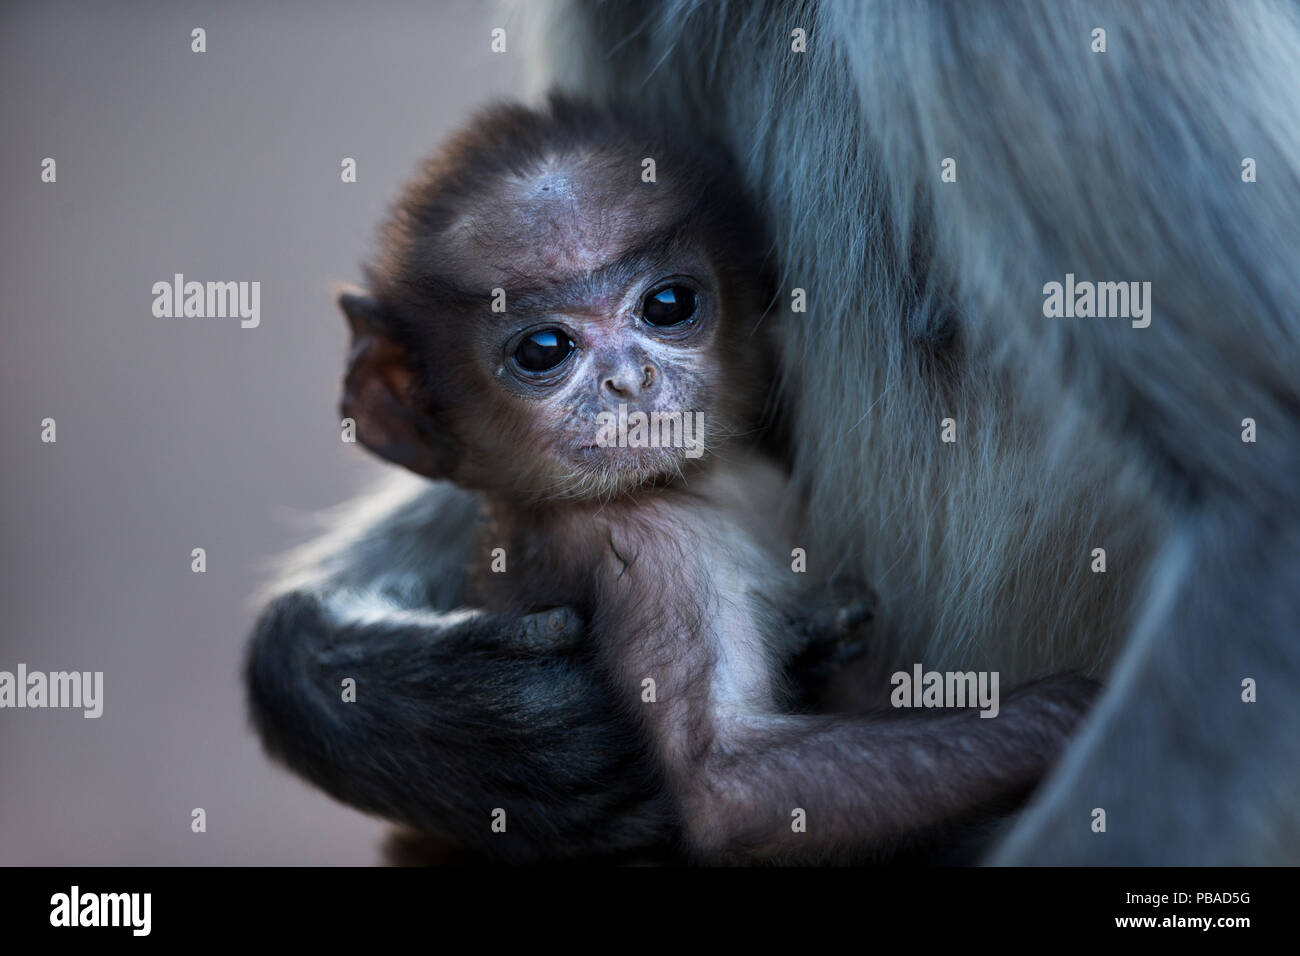 Southern plains grey langur / Hanuman langur (Semnopithecus dussumieri) infant aged a few weeks. Jodhpur, Rajasthan, India. March. - Stock Image